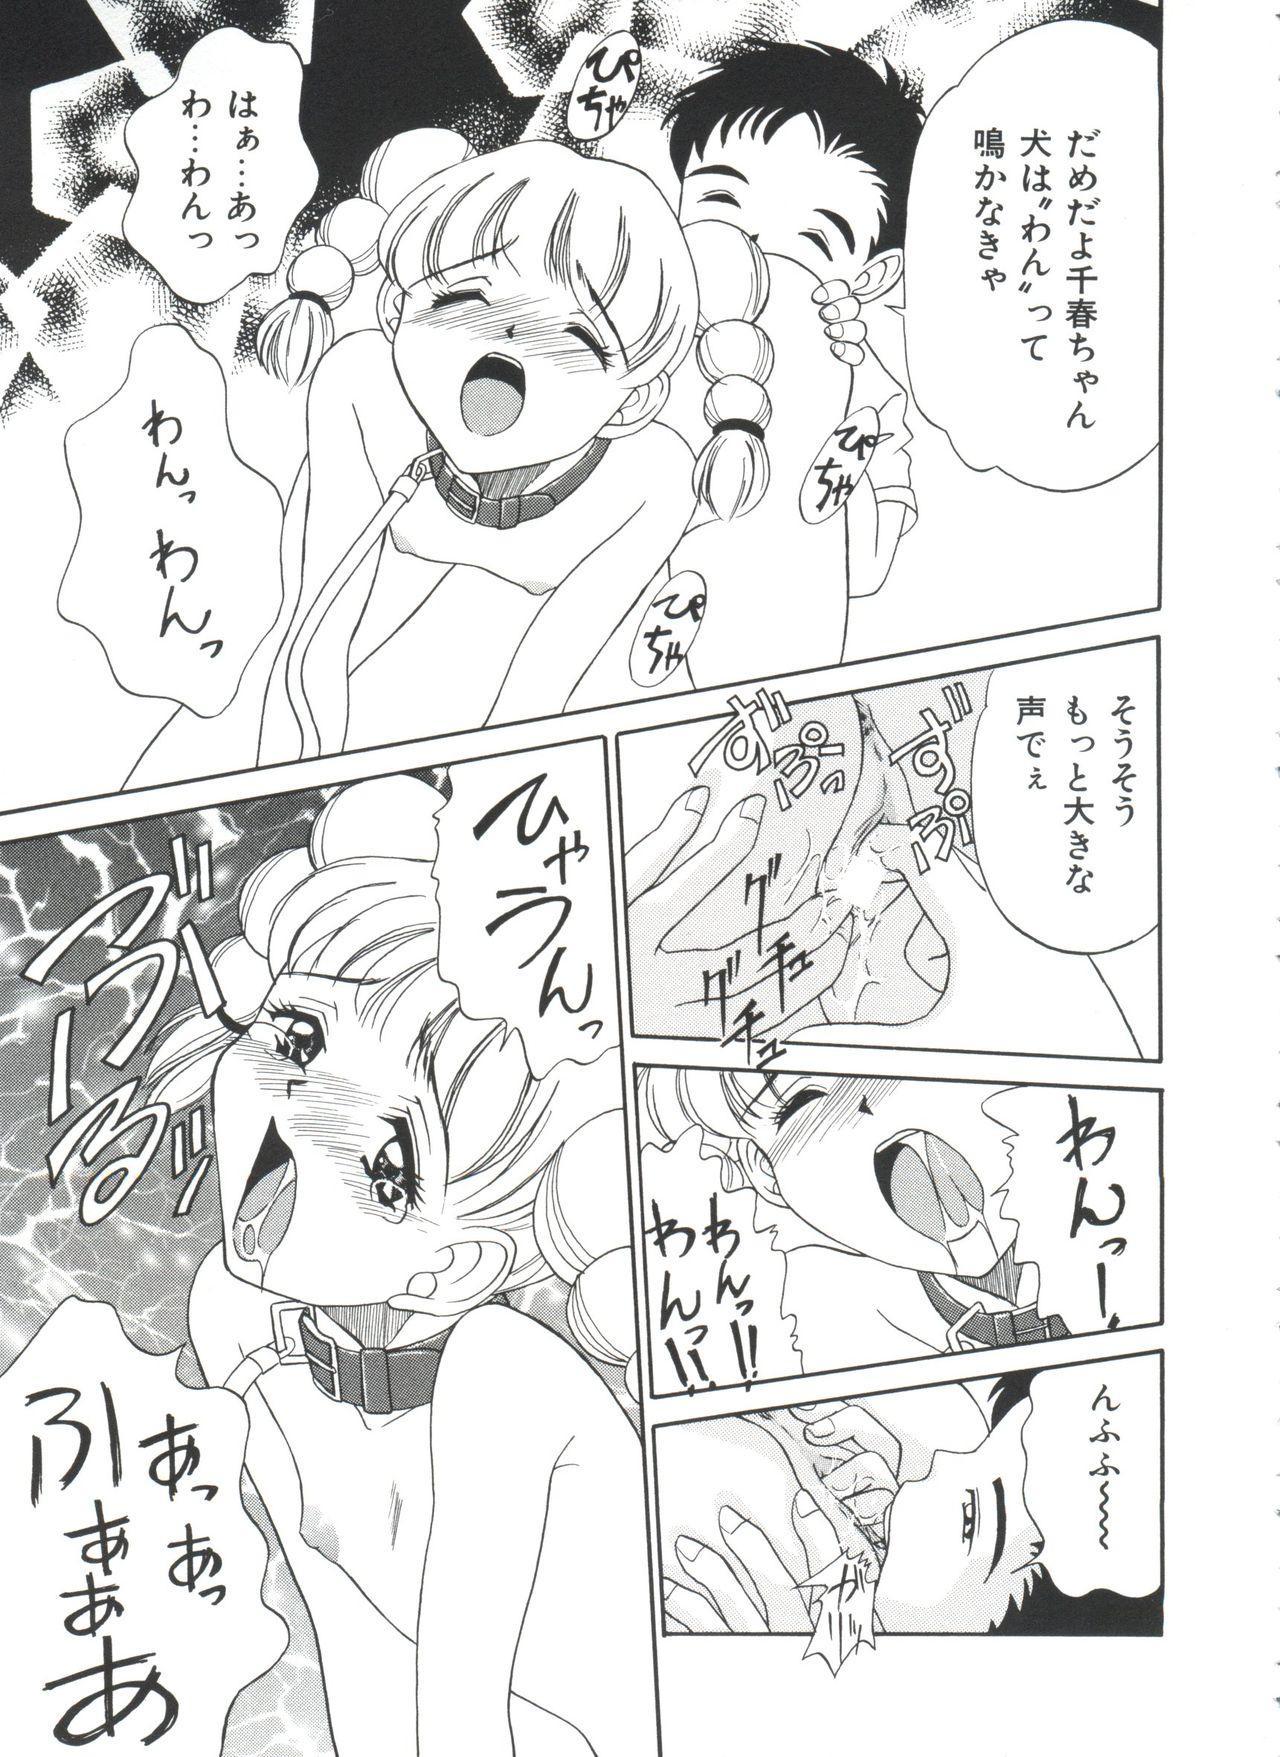 Ero-chan to Issho 2 56